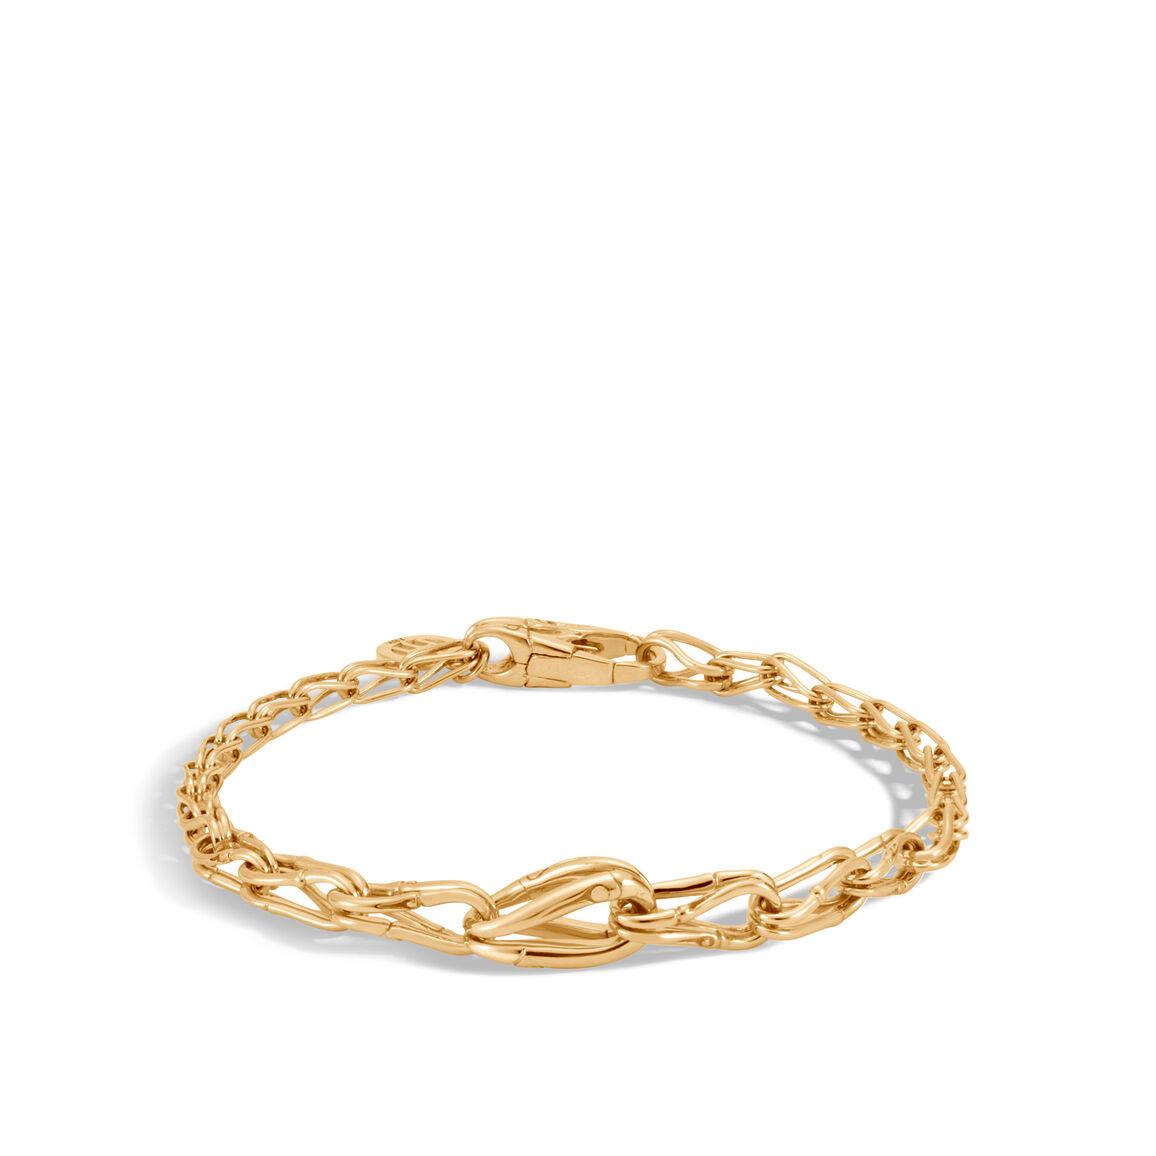 Bamboo 6MM Graduated Link Bracelet in 18K Gold